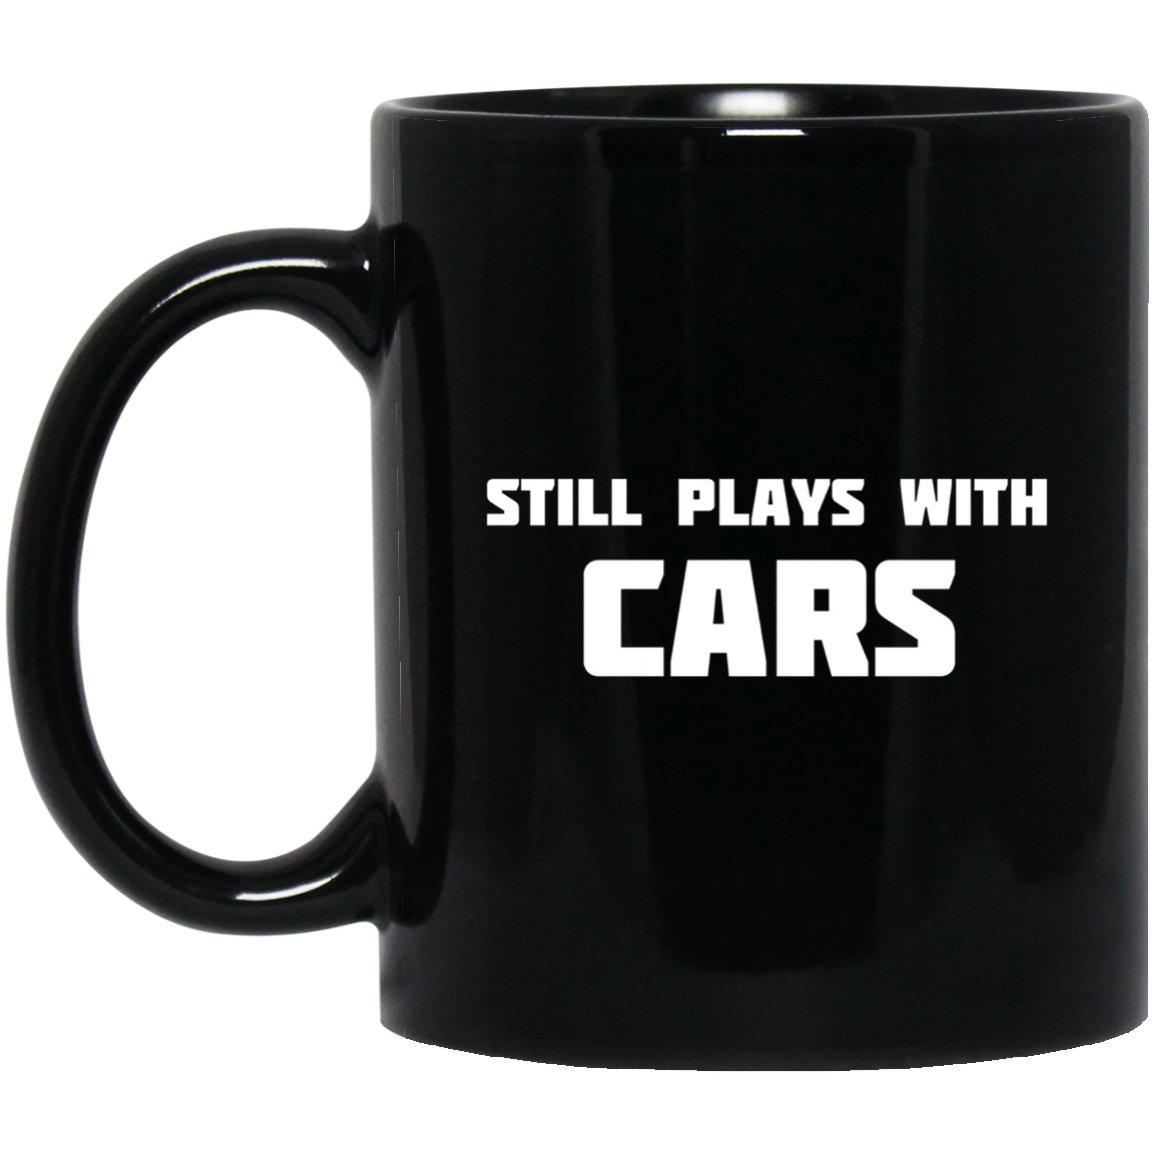 Still Plays With Cars Racer Street Black  Mug Black Ceramic 11oz Coffee Tea Cup